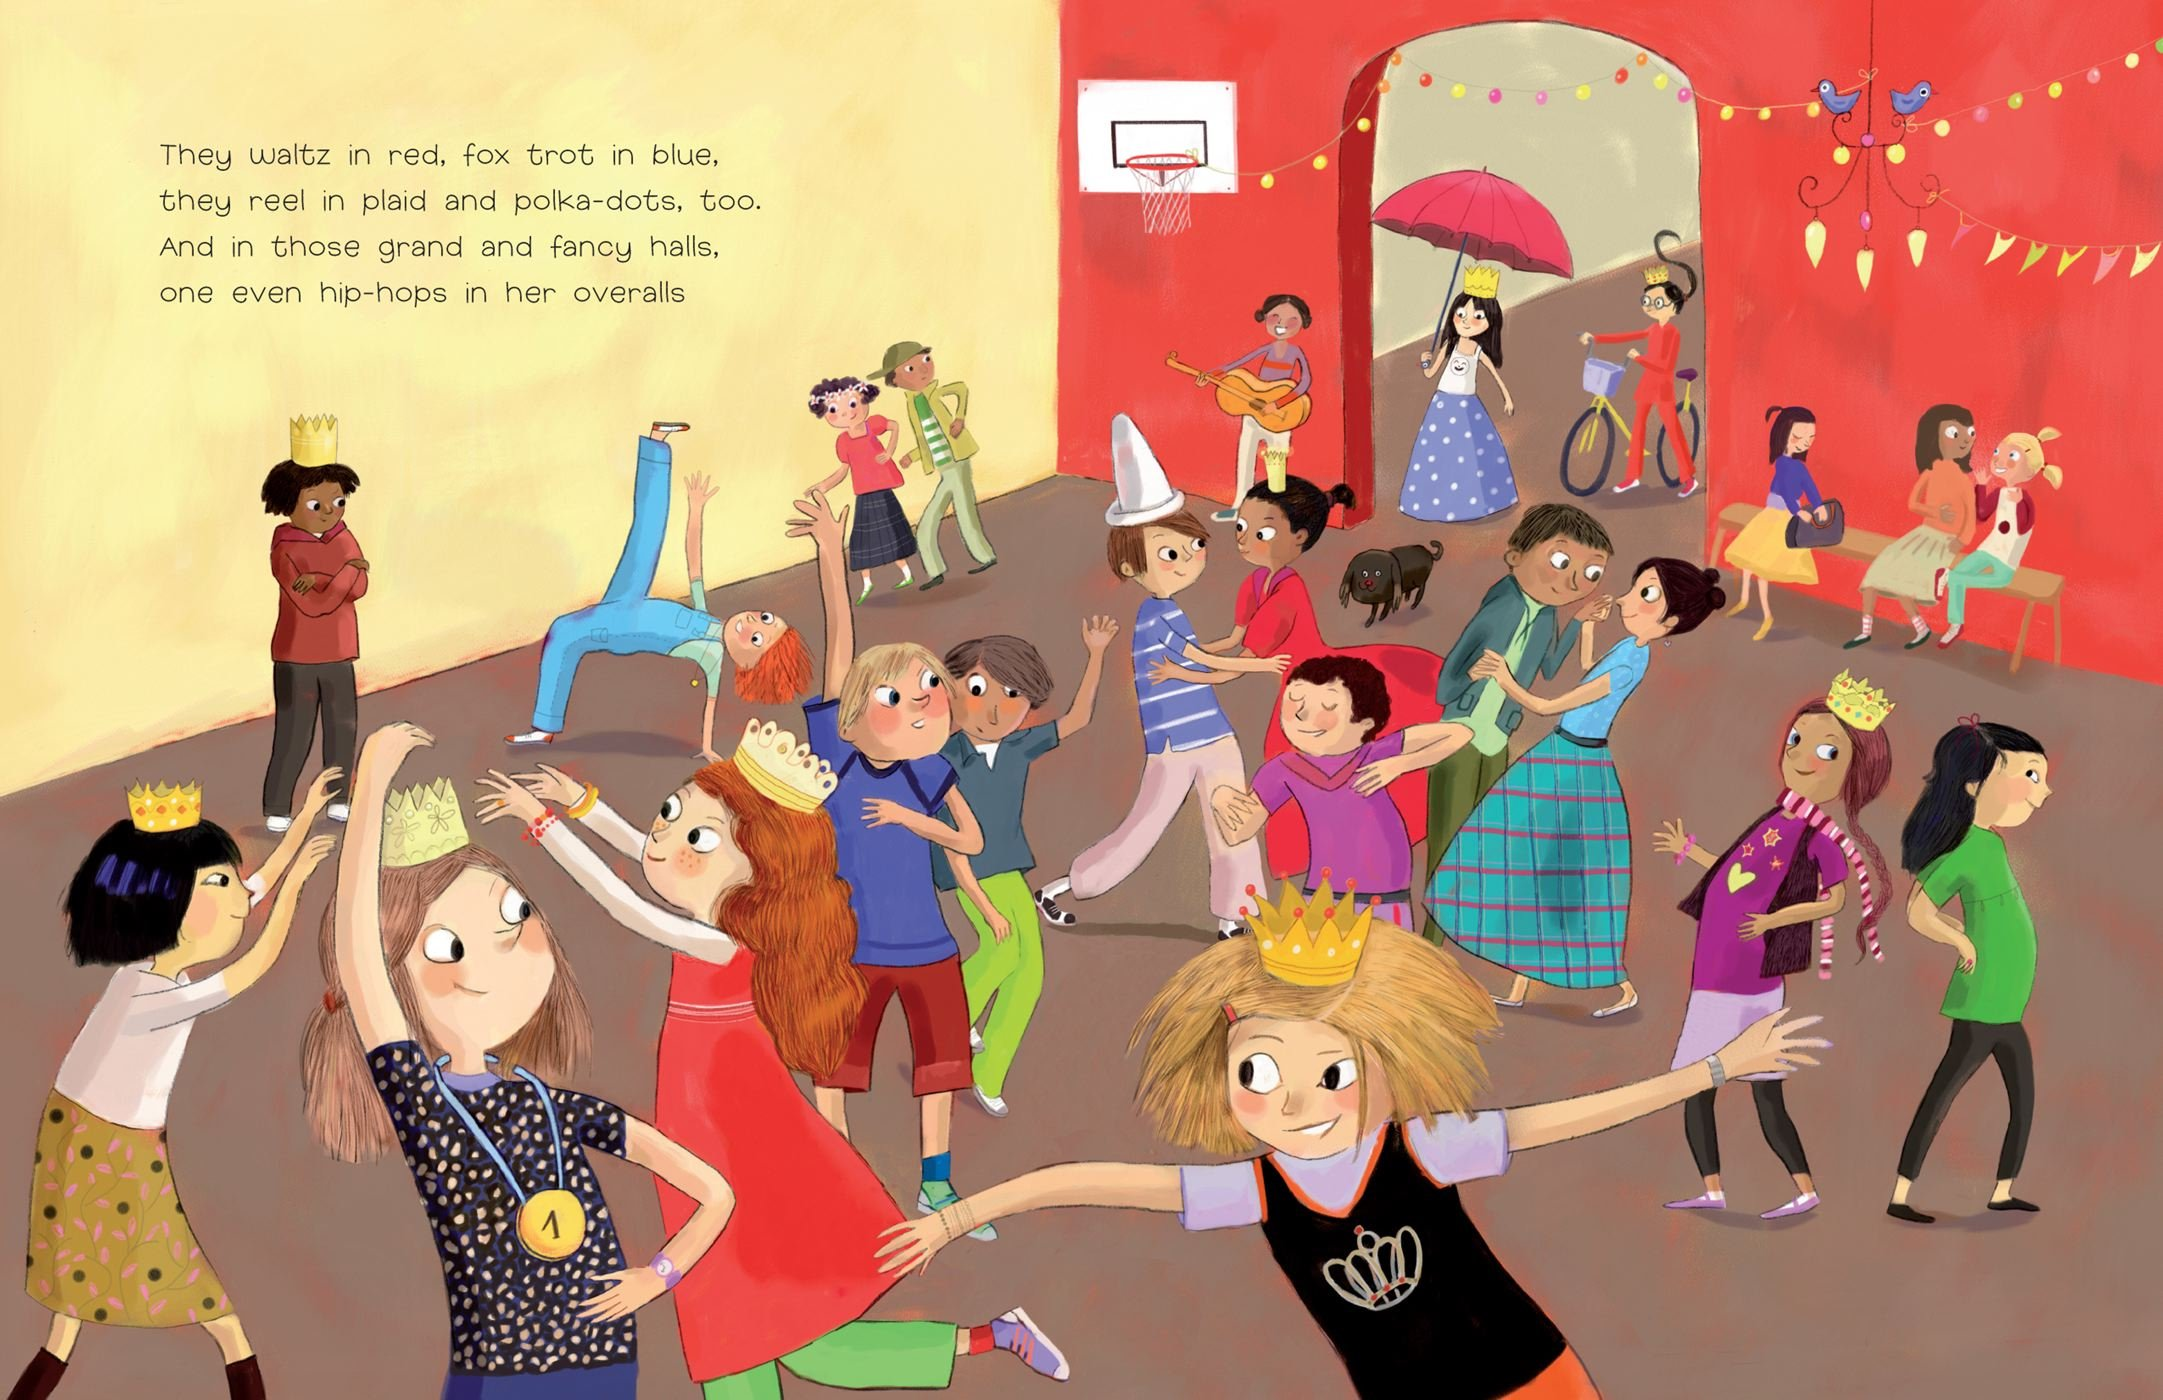 9 Children's Books That Celebrate Gender Equality